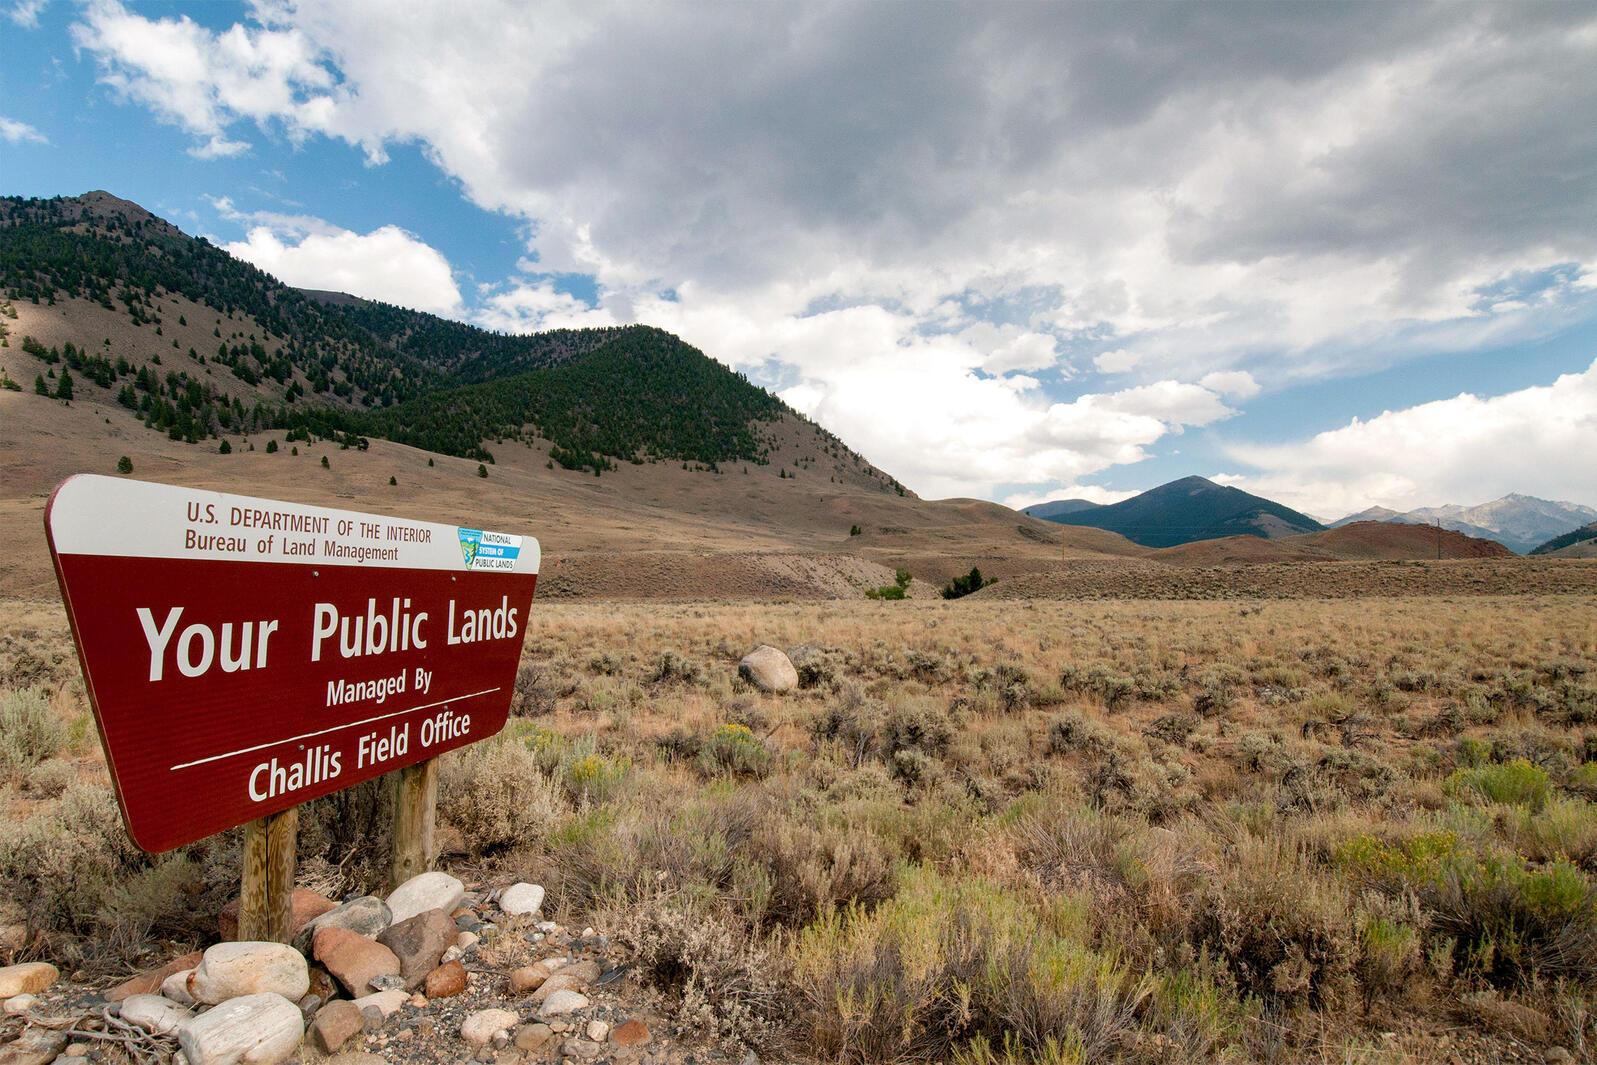 Bureau of Land Management public lands sign in Idaho. William Mullins/Alamy